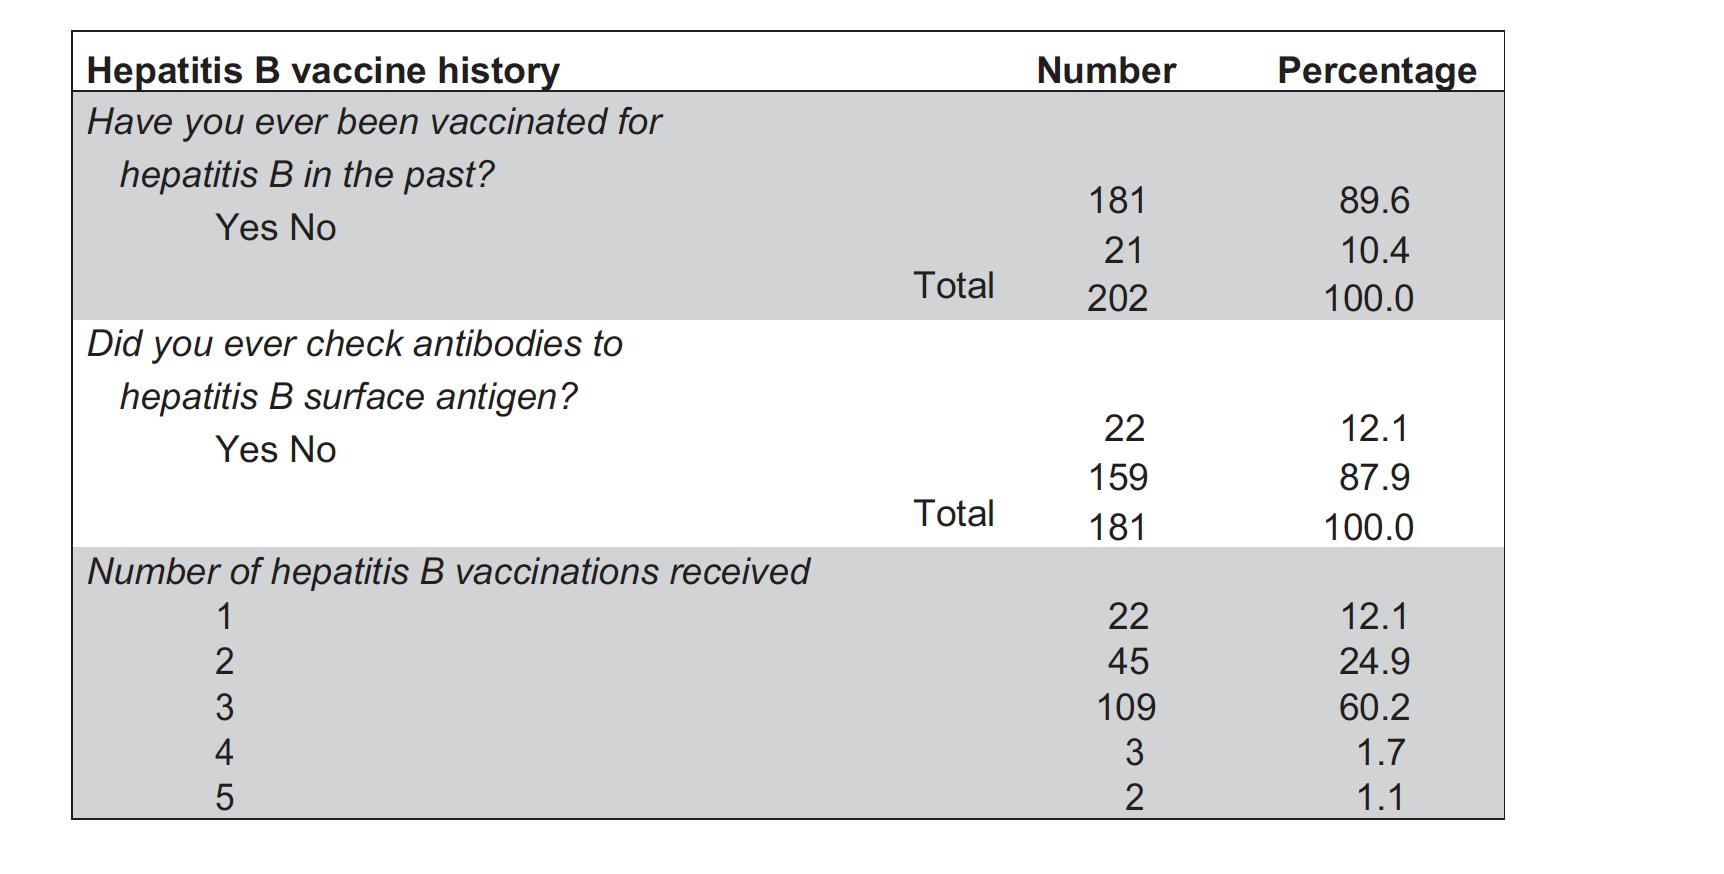 Hepatitis B vaccine history